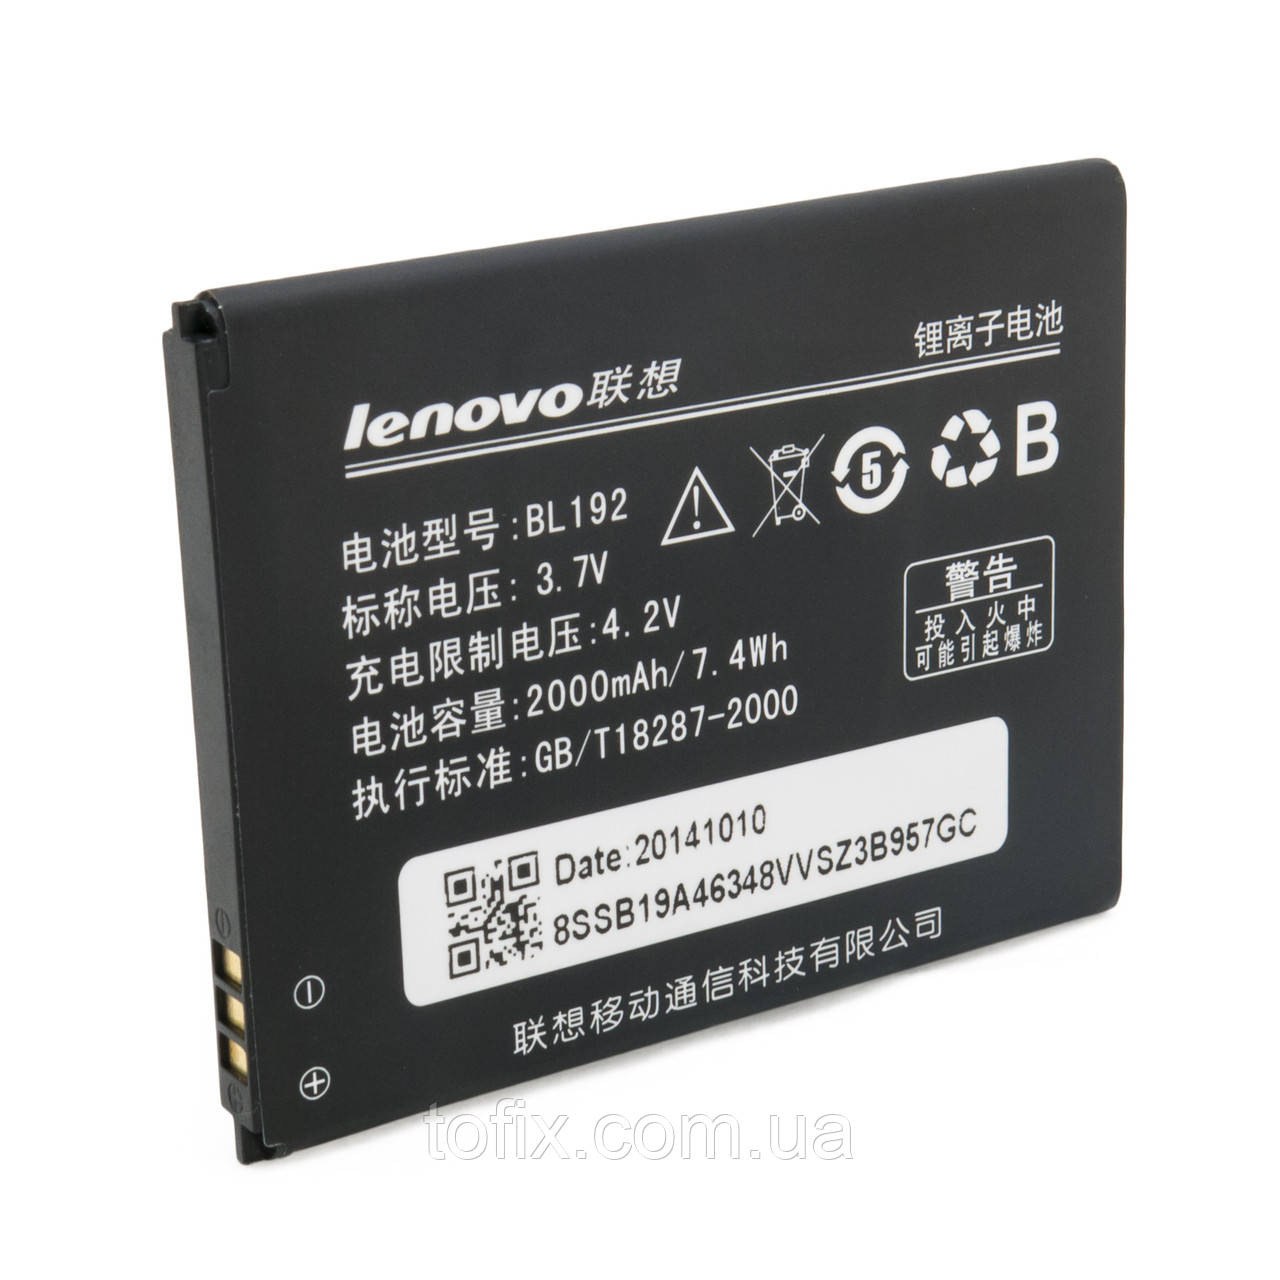 Батарея (акб, акумулятор) BL192 для Lenovo A680 IdeaPhone, 2000 mAh, оригінал